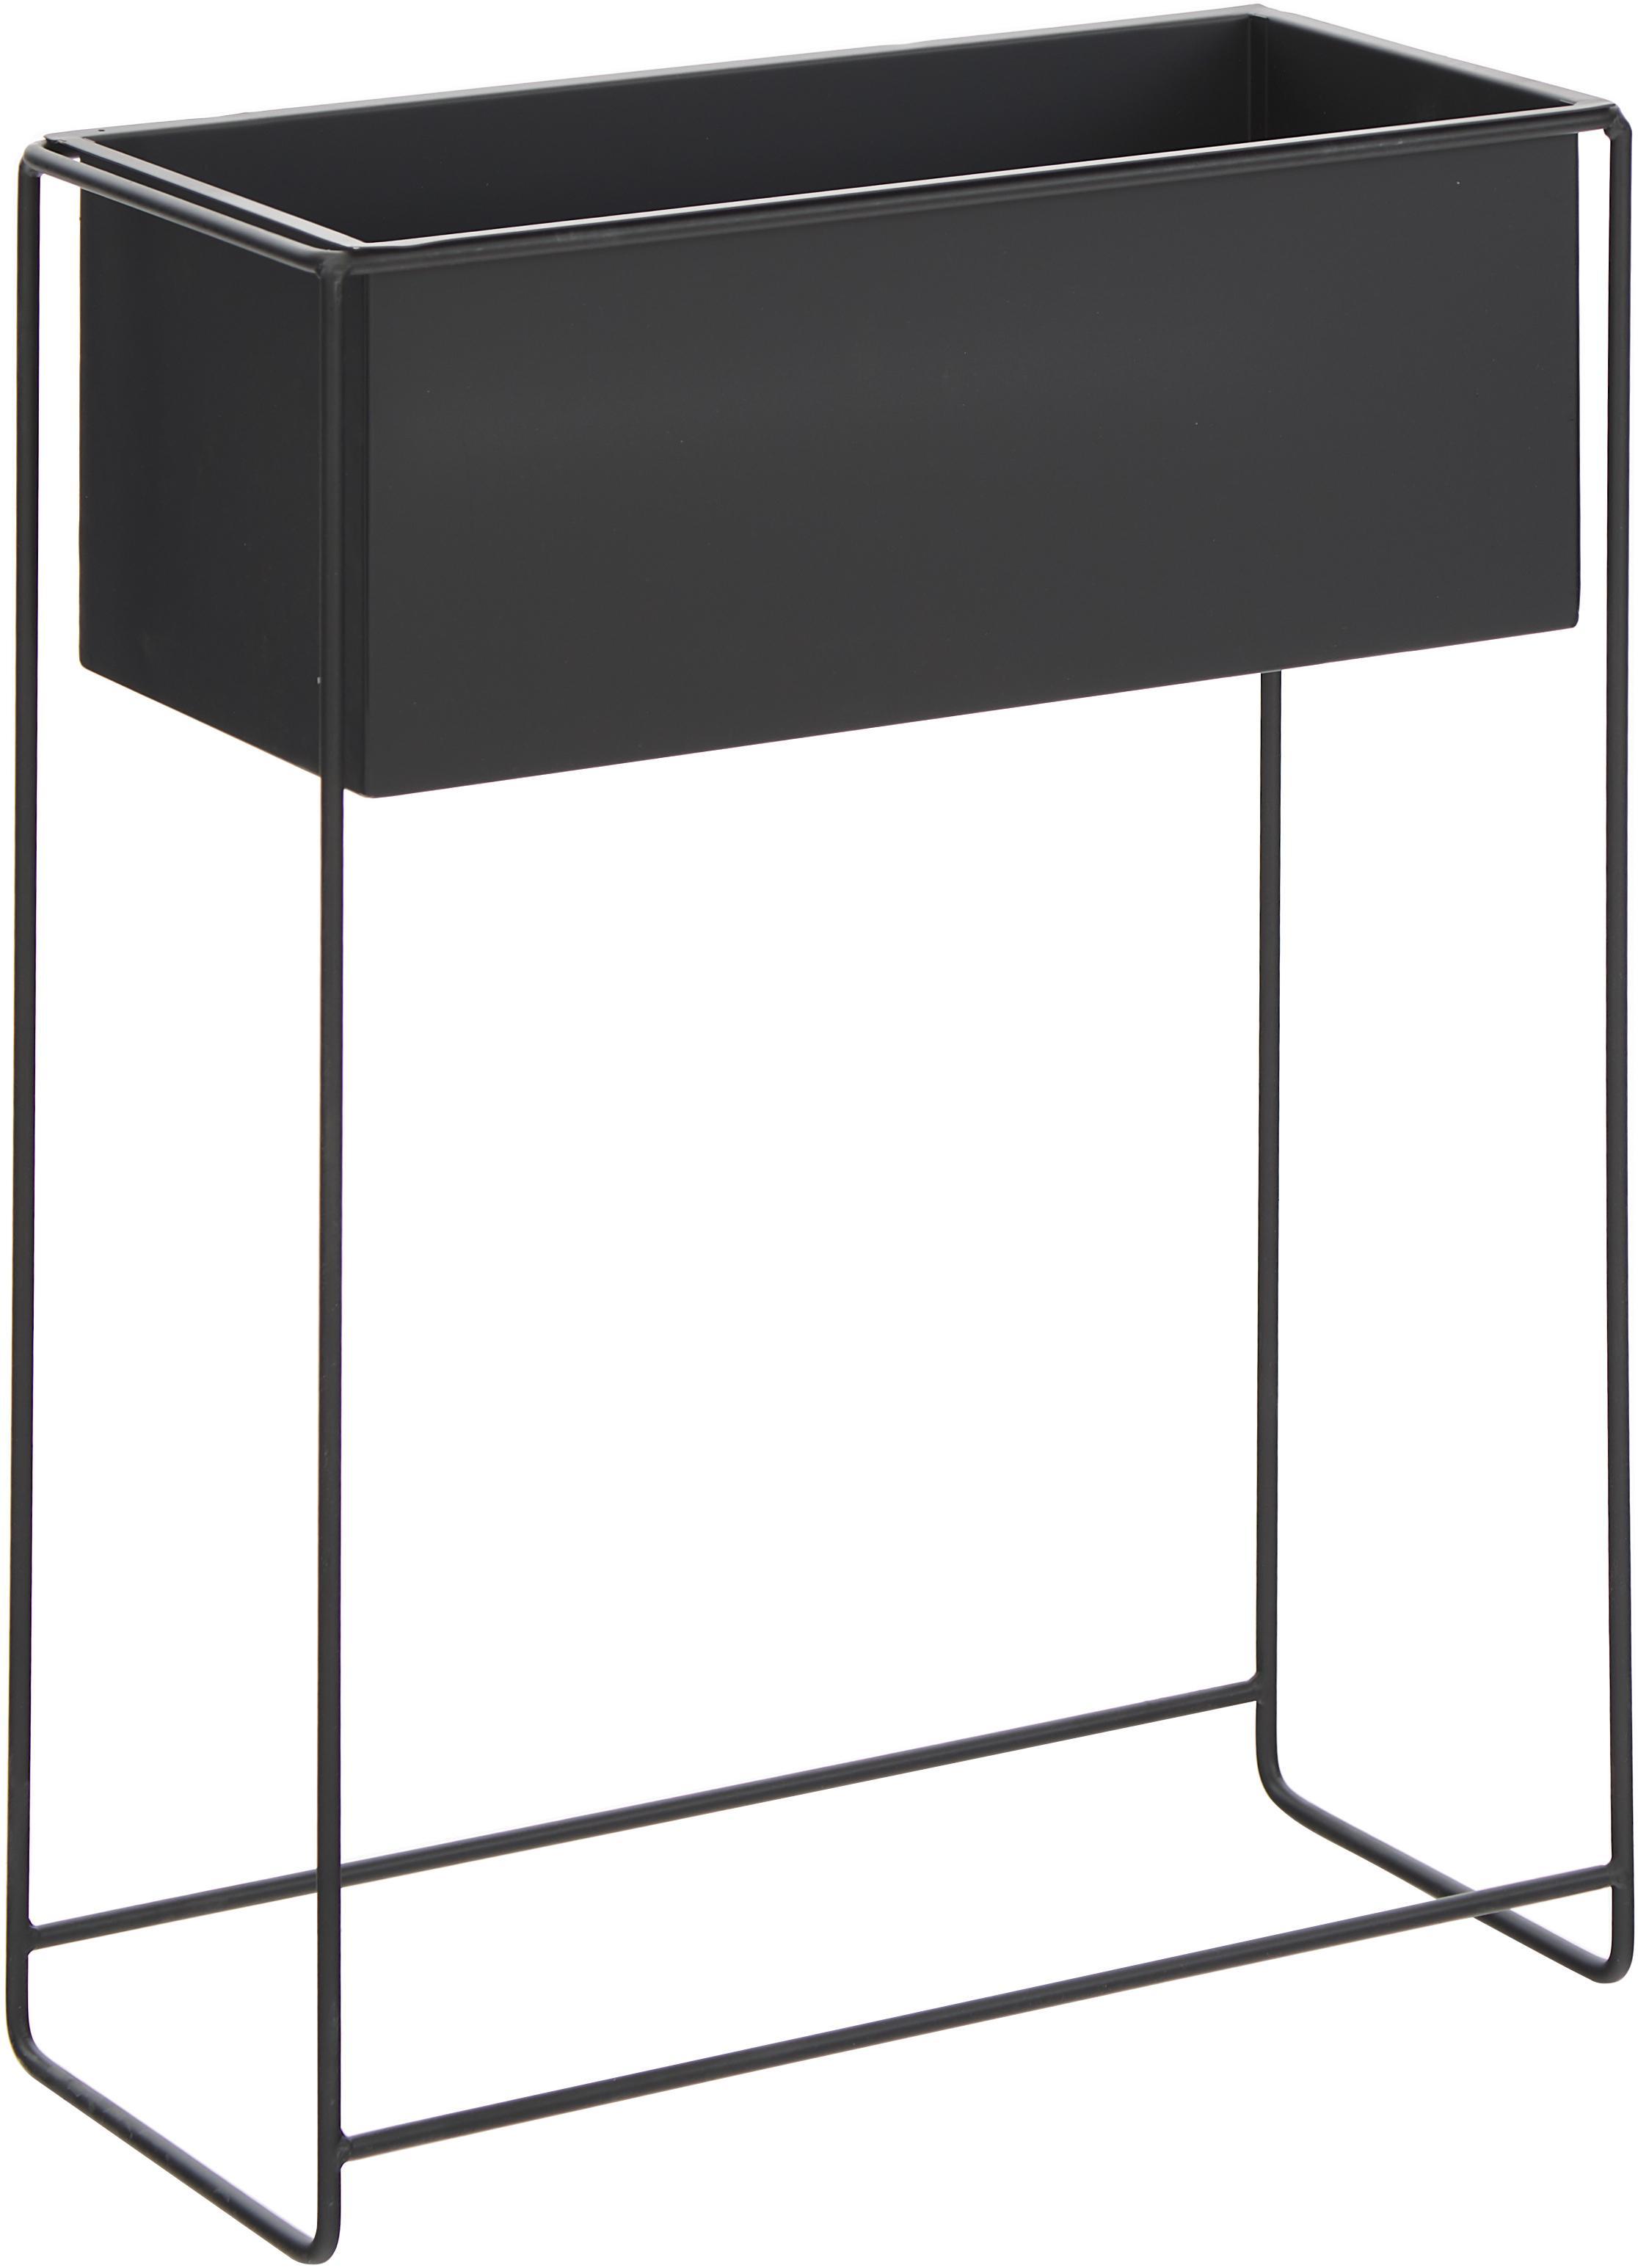 Übertopf Flina, Metall, beschichtet, Schwarz, 51 x 65 cm